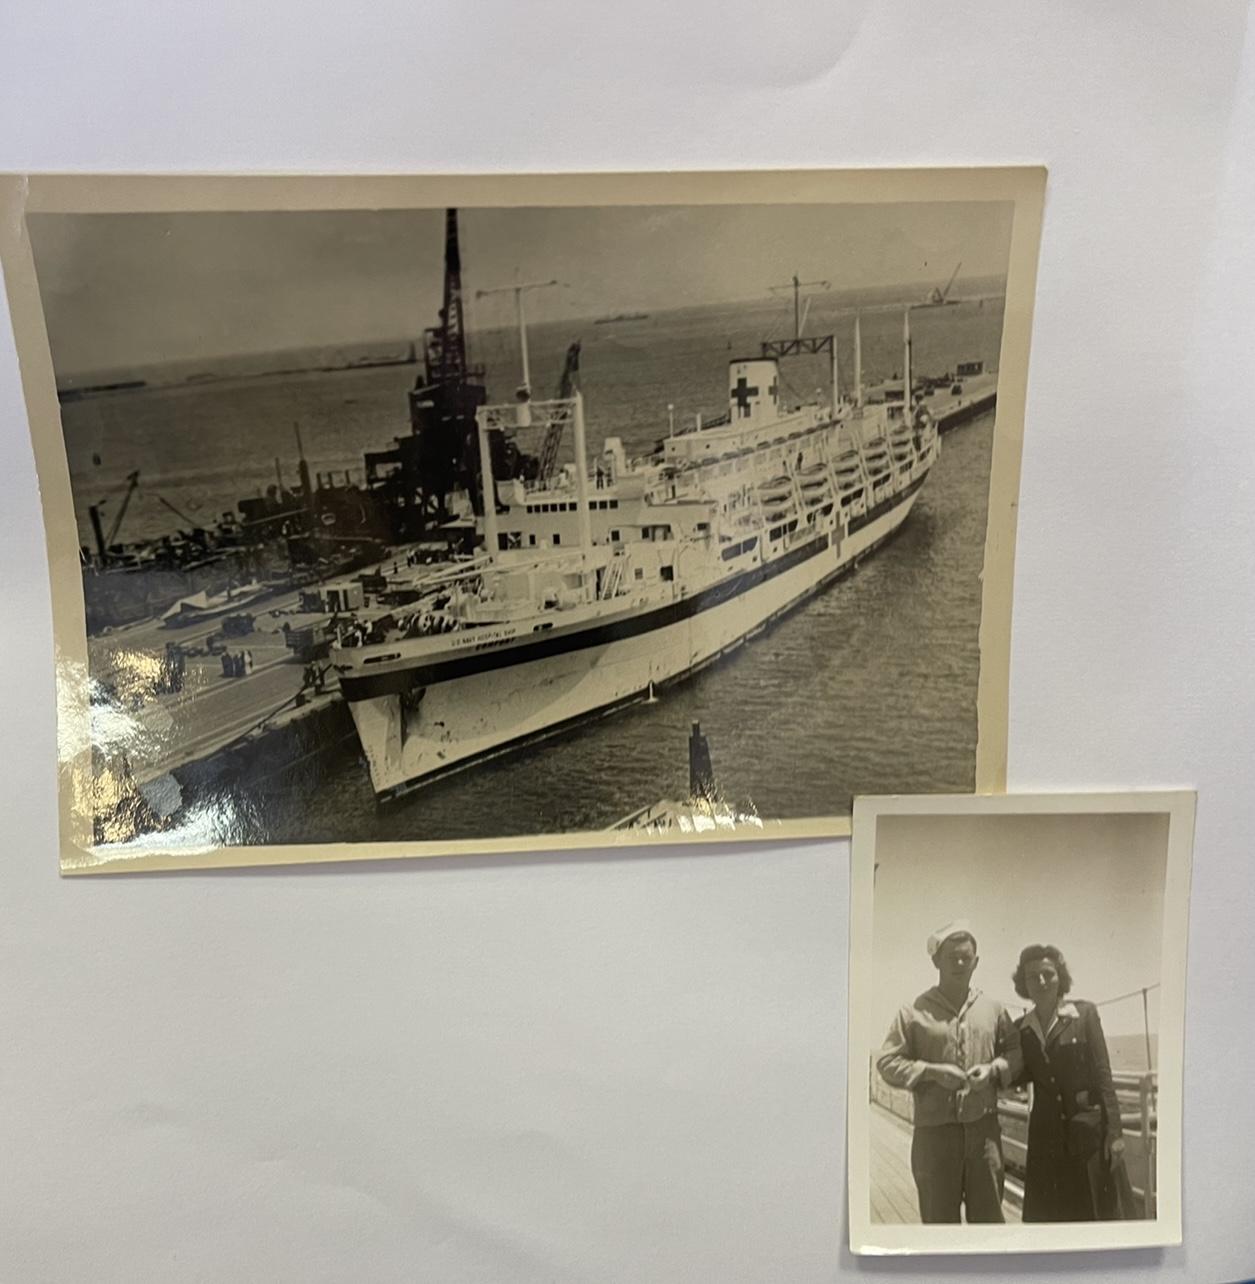 WW 2 Nurse Returns to Desert Regional Medical Center 78 Years After Service